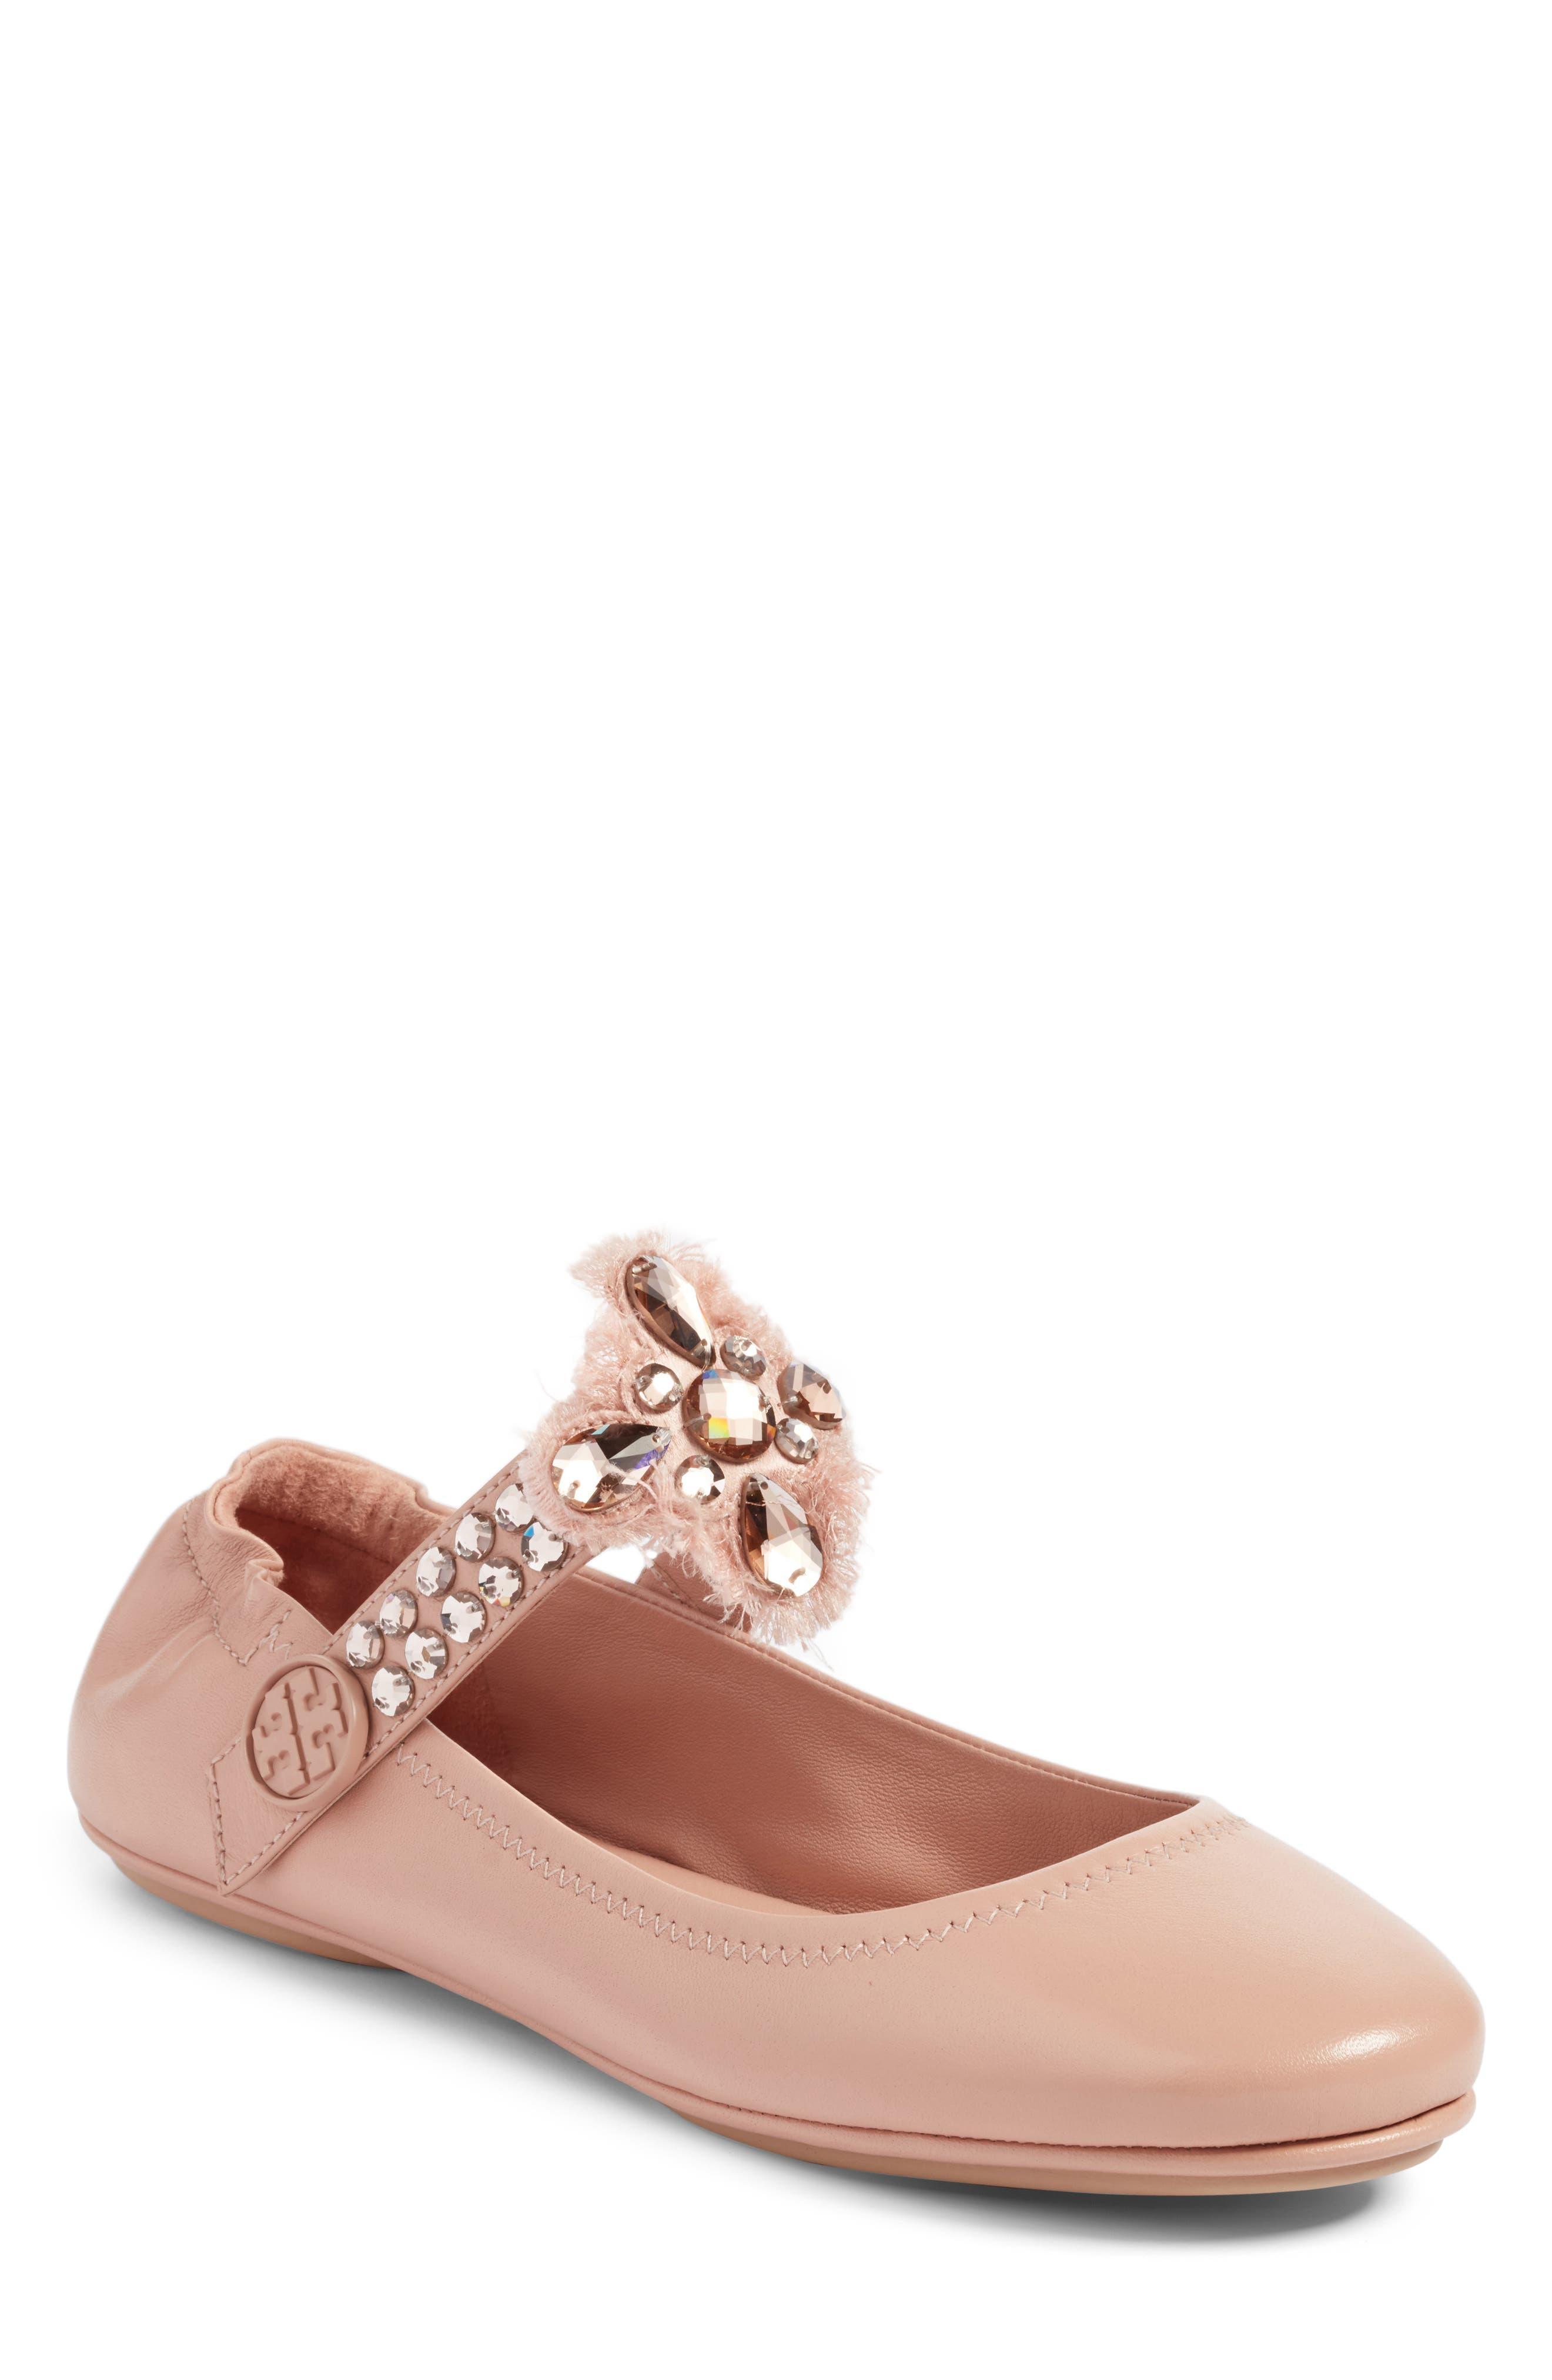 Minnie Embellished Convertible Strap Ballet Flat,                             Main thumbnail 3, color,